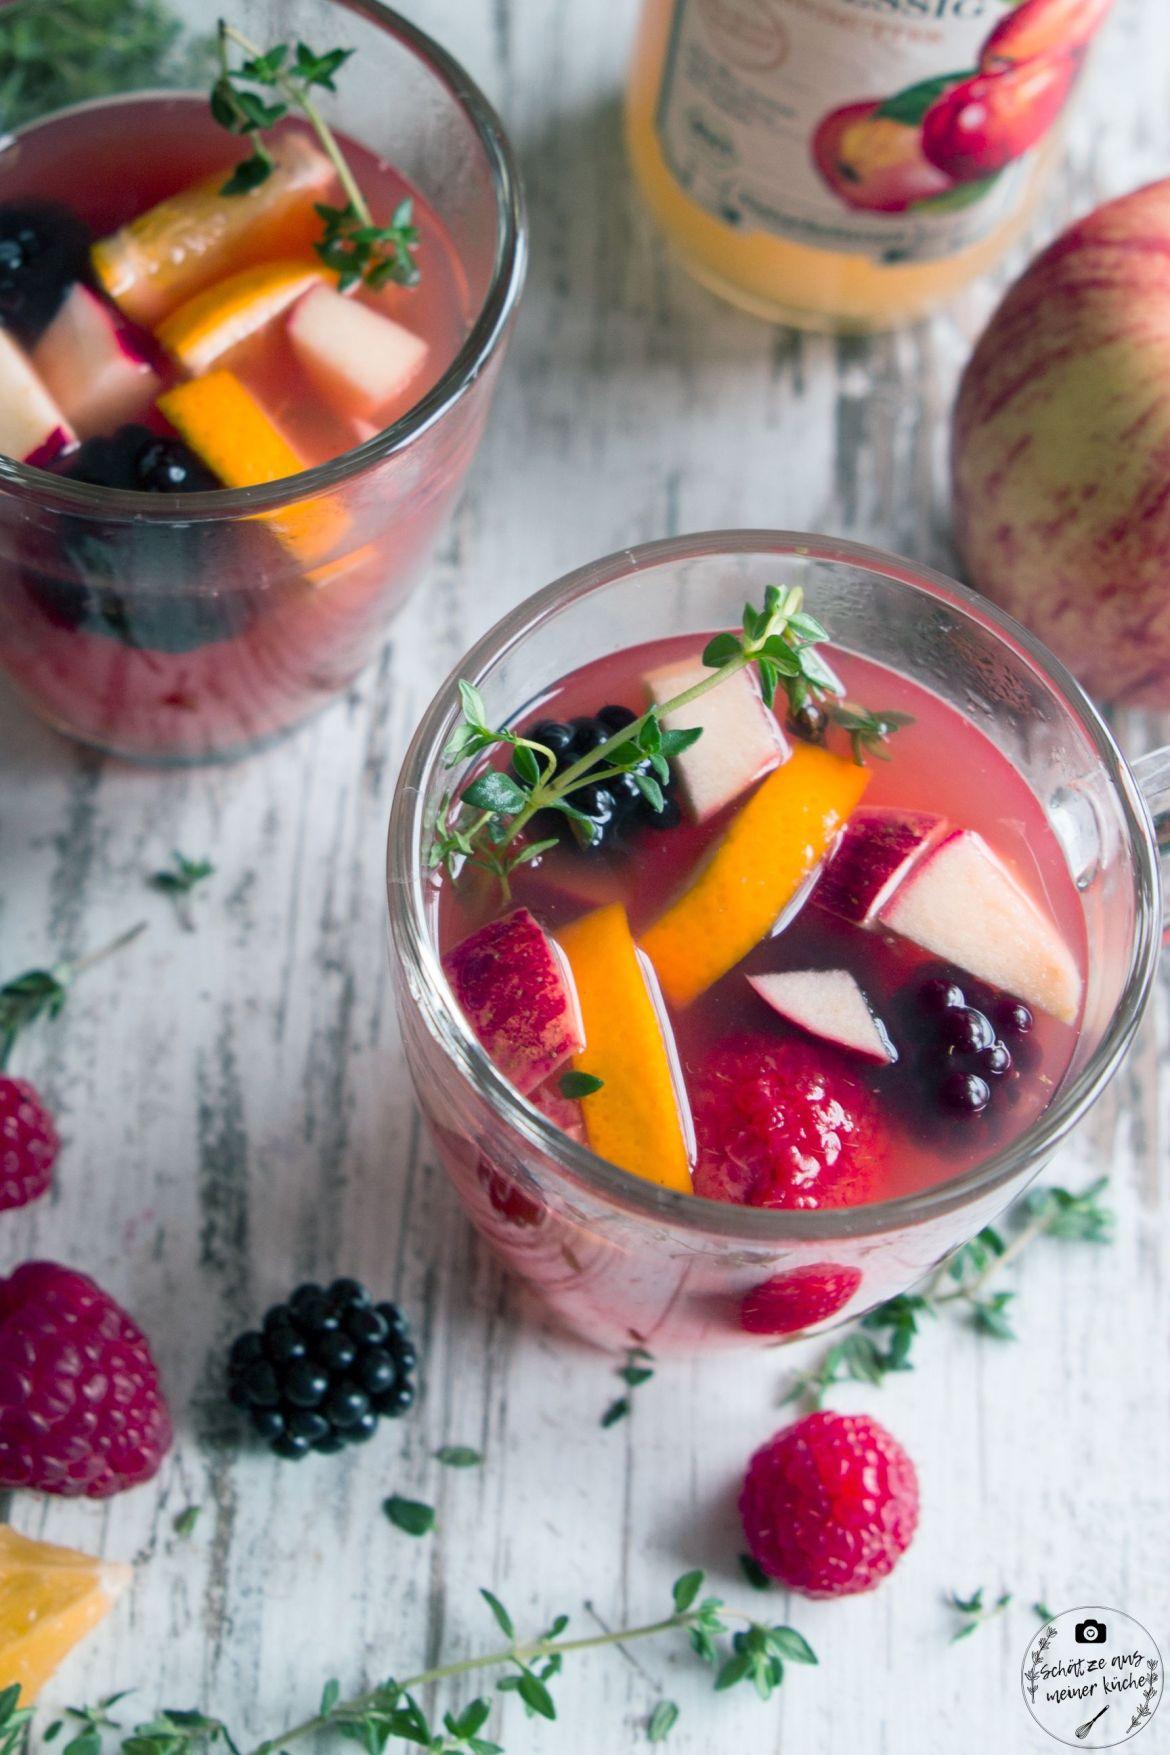 Berry-Apple-Punch Apfelessig Mazzetti l'Originale